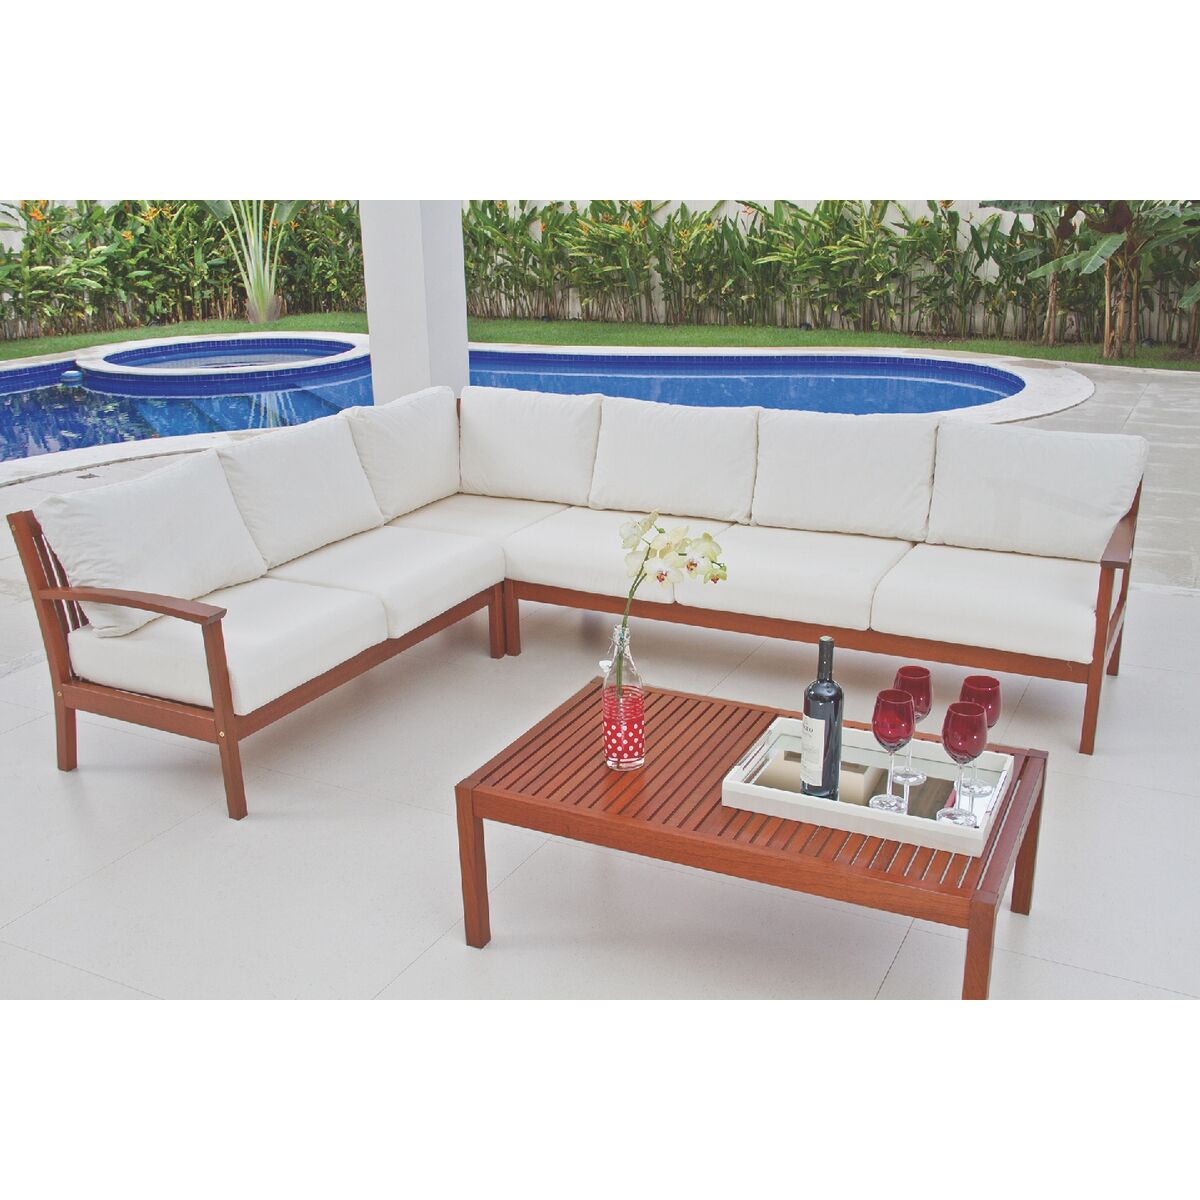 Tramontina - 2 Seats Sofa without Arms w/ Jatobá Wood and AcquaBlock ...